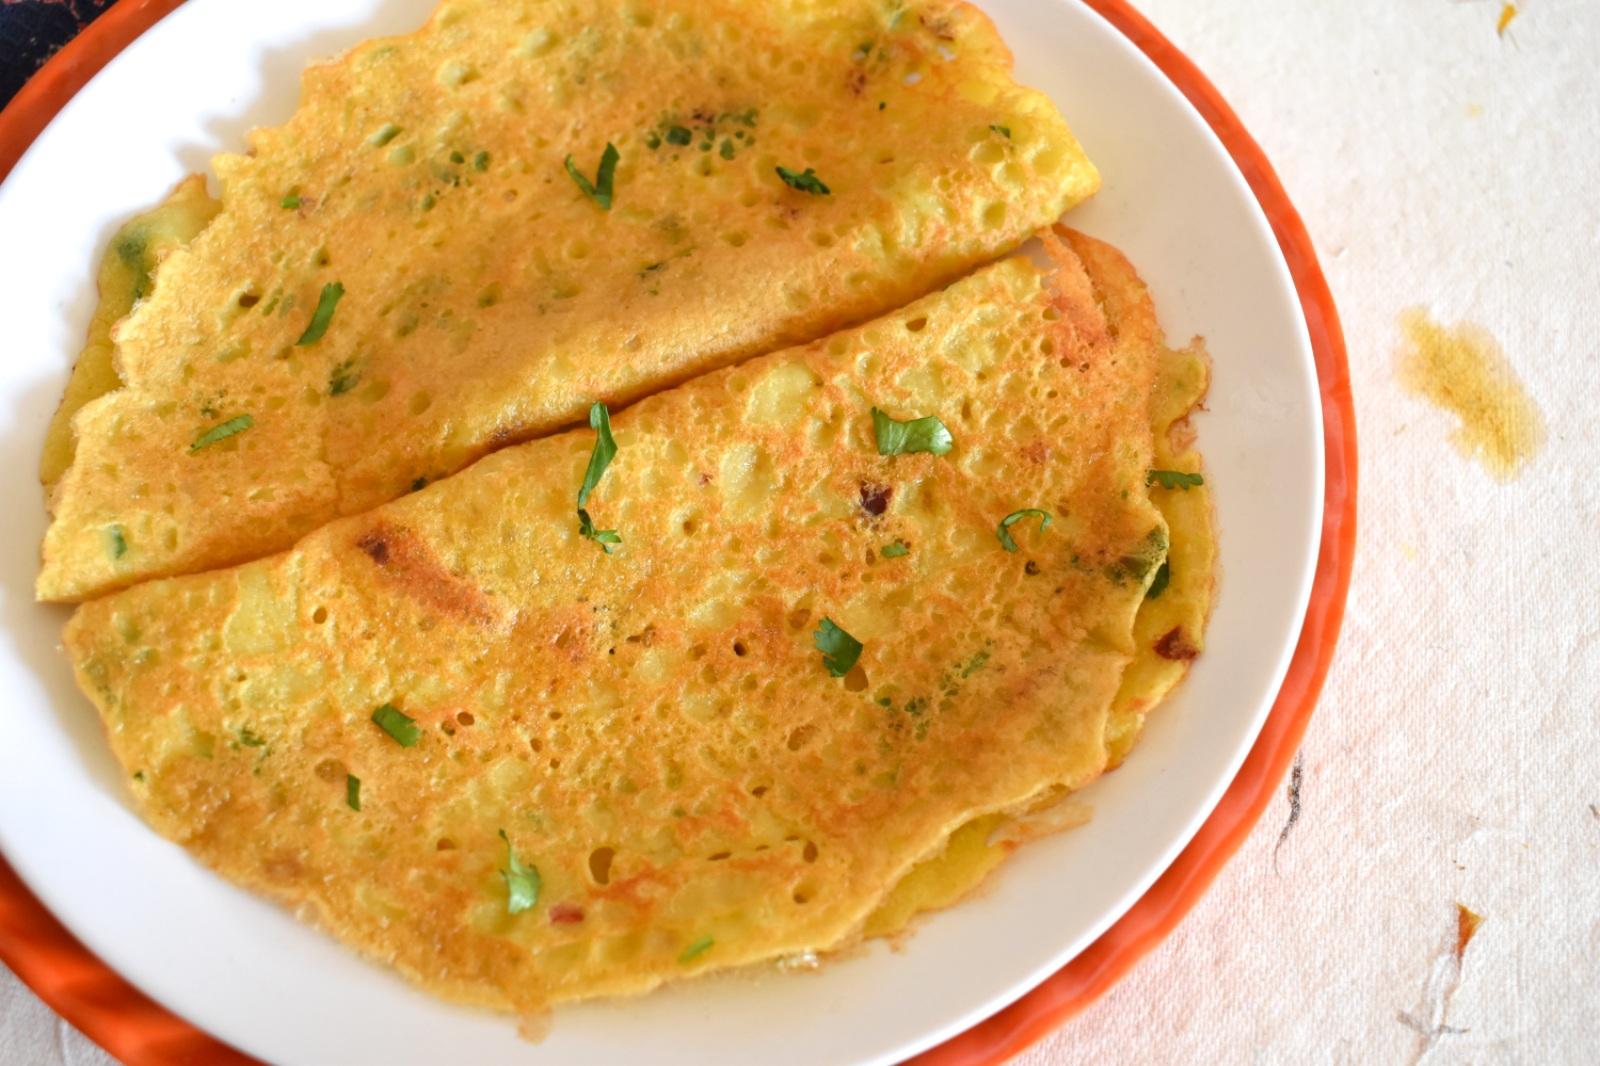 recipes using moong dal